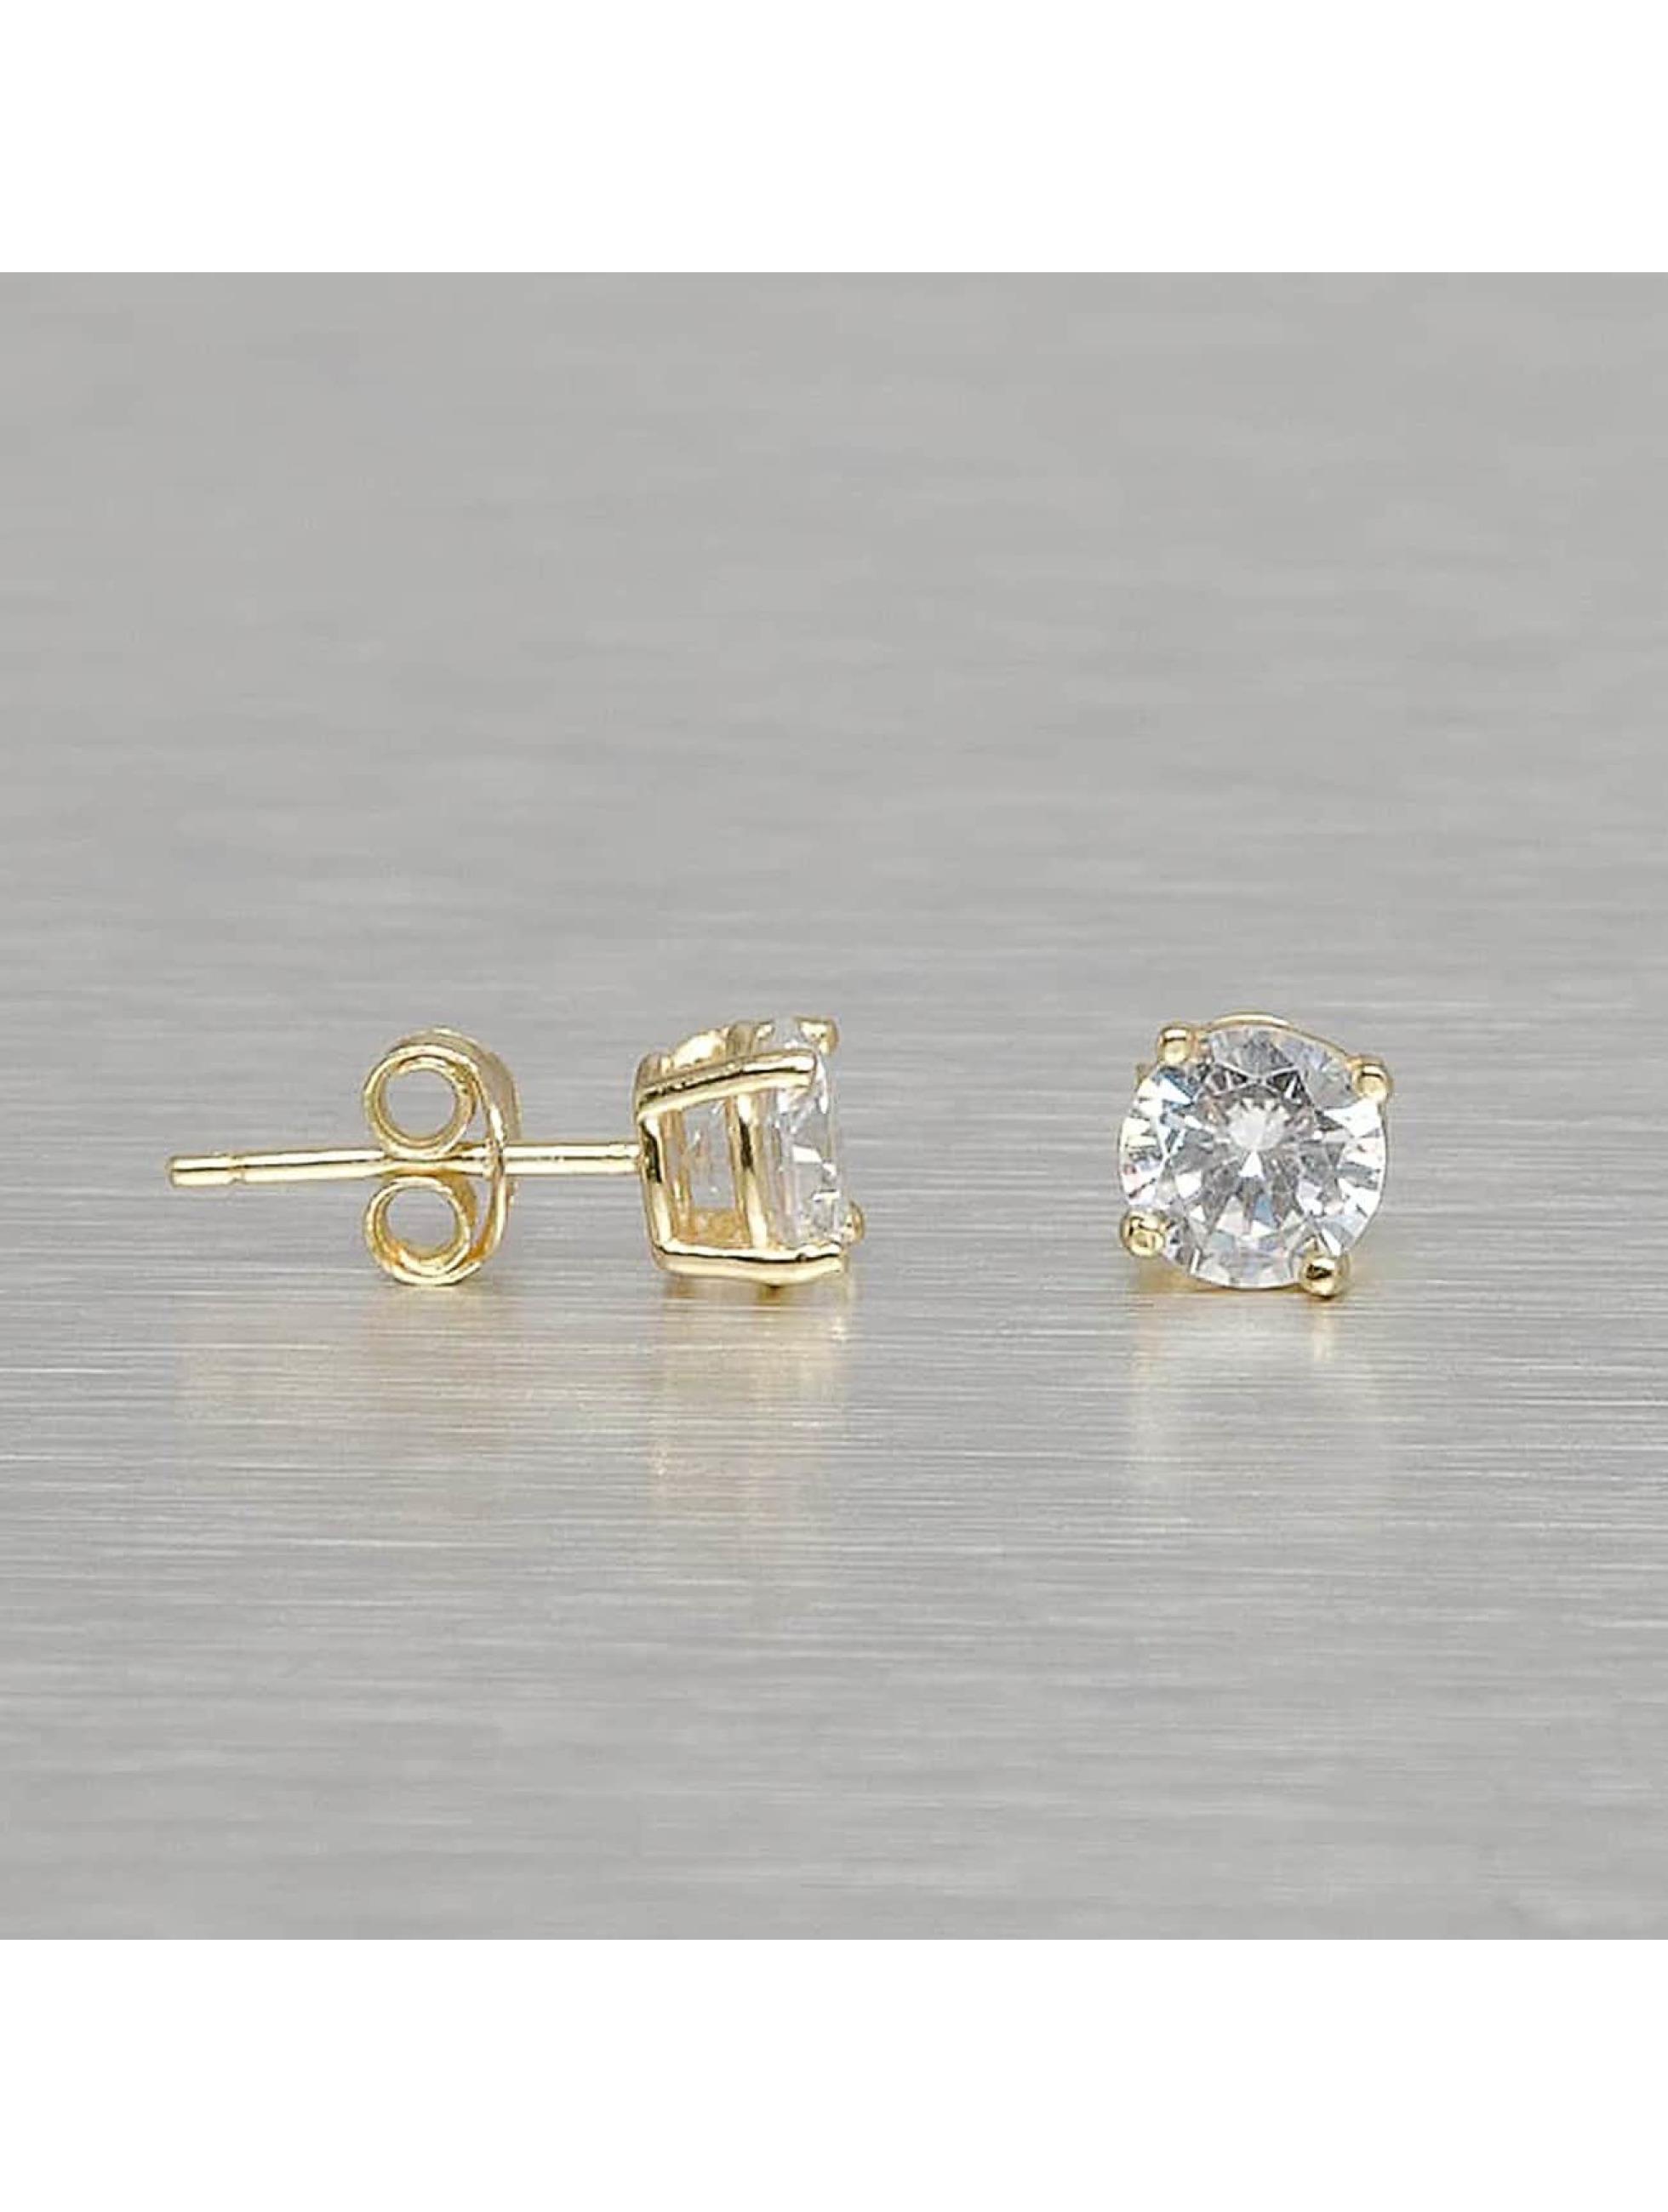 KING ICE Männer,Frauen Ohrringe Gold_Plated 6mm 925 Sterling_Silver Round Cut in goldfarben